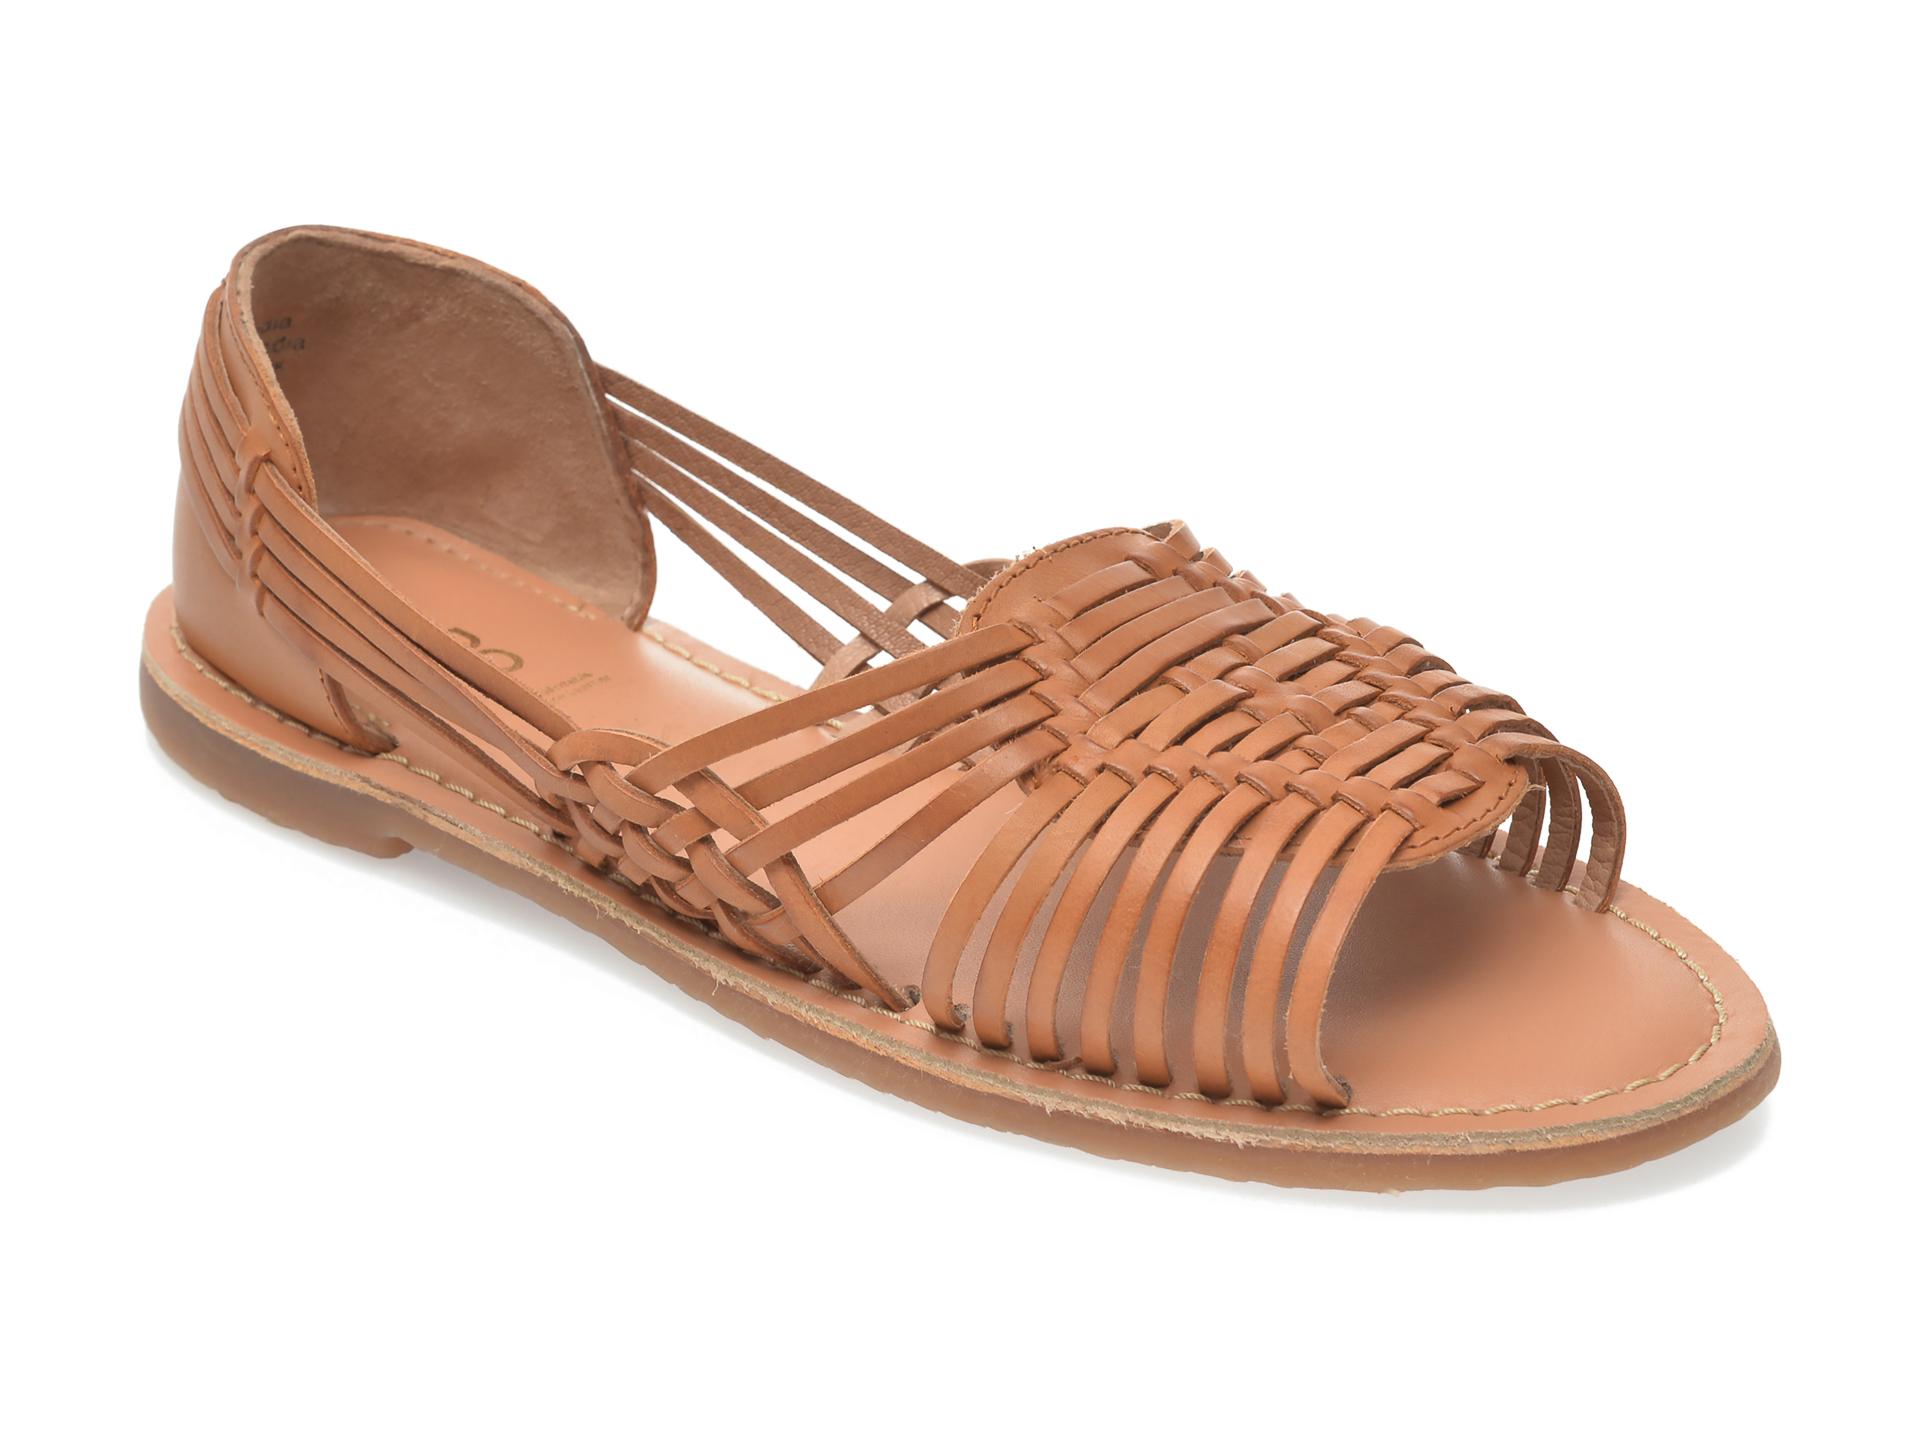 Sandale ALDO maro, Ariadnee220, din piele naturala imagine otter.ro 2021